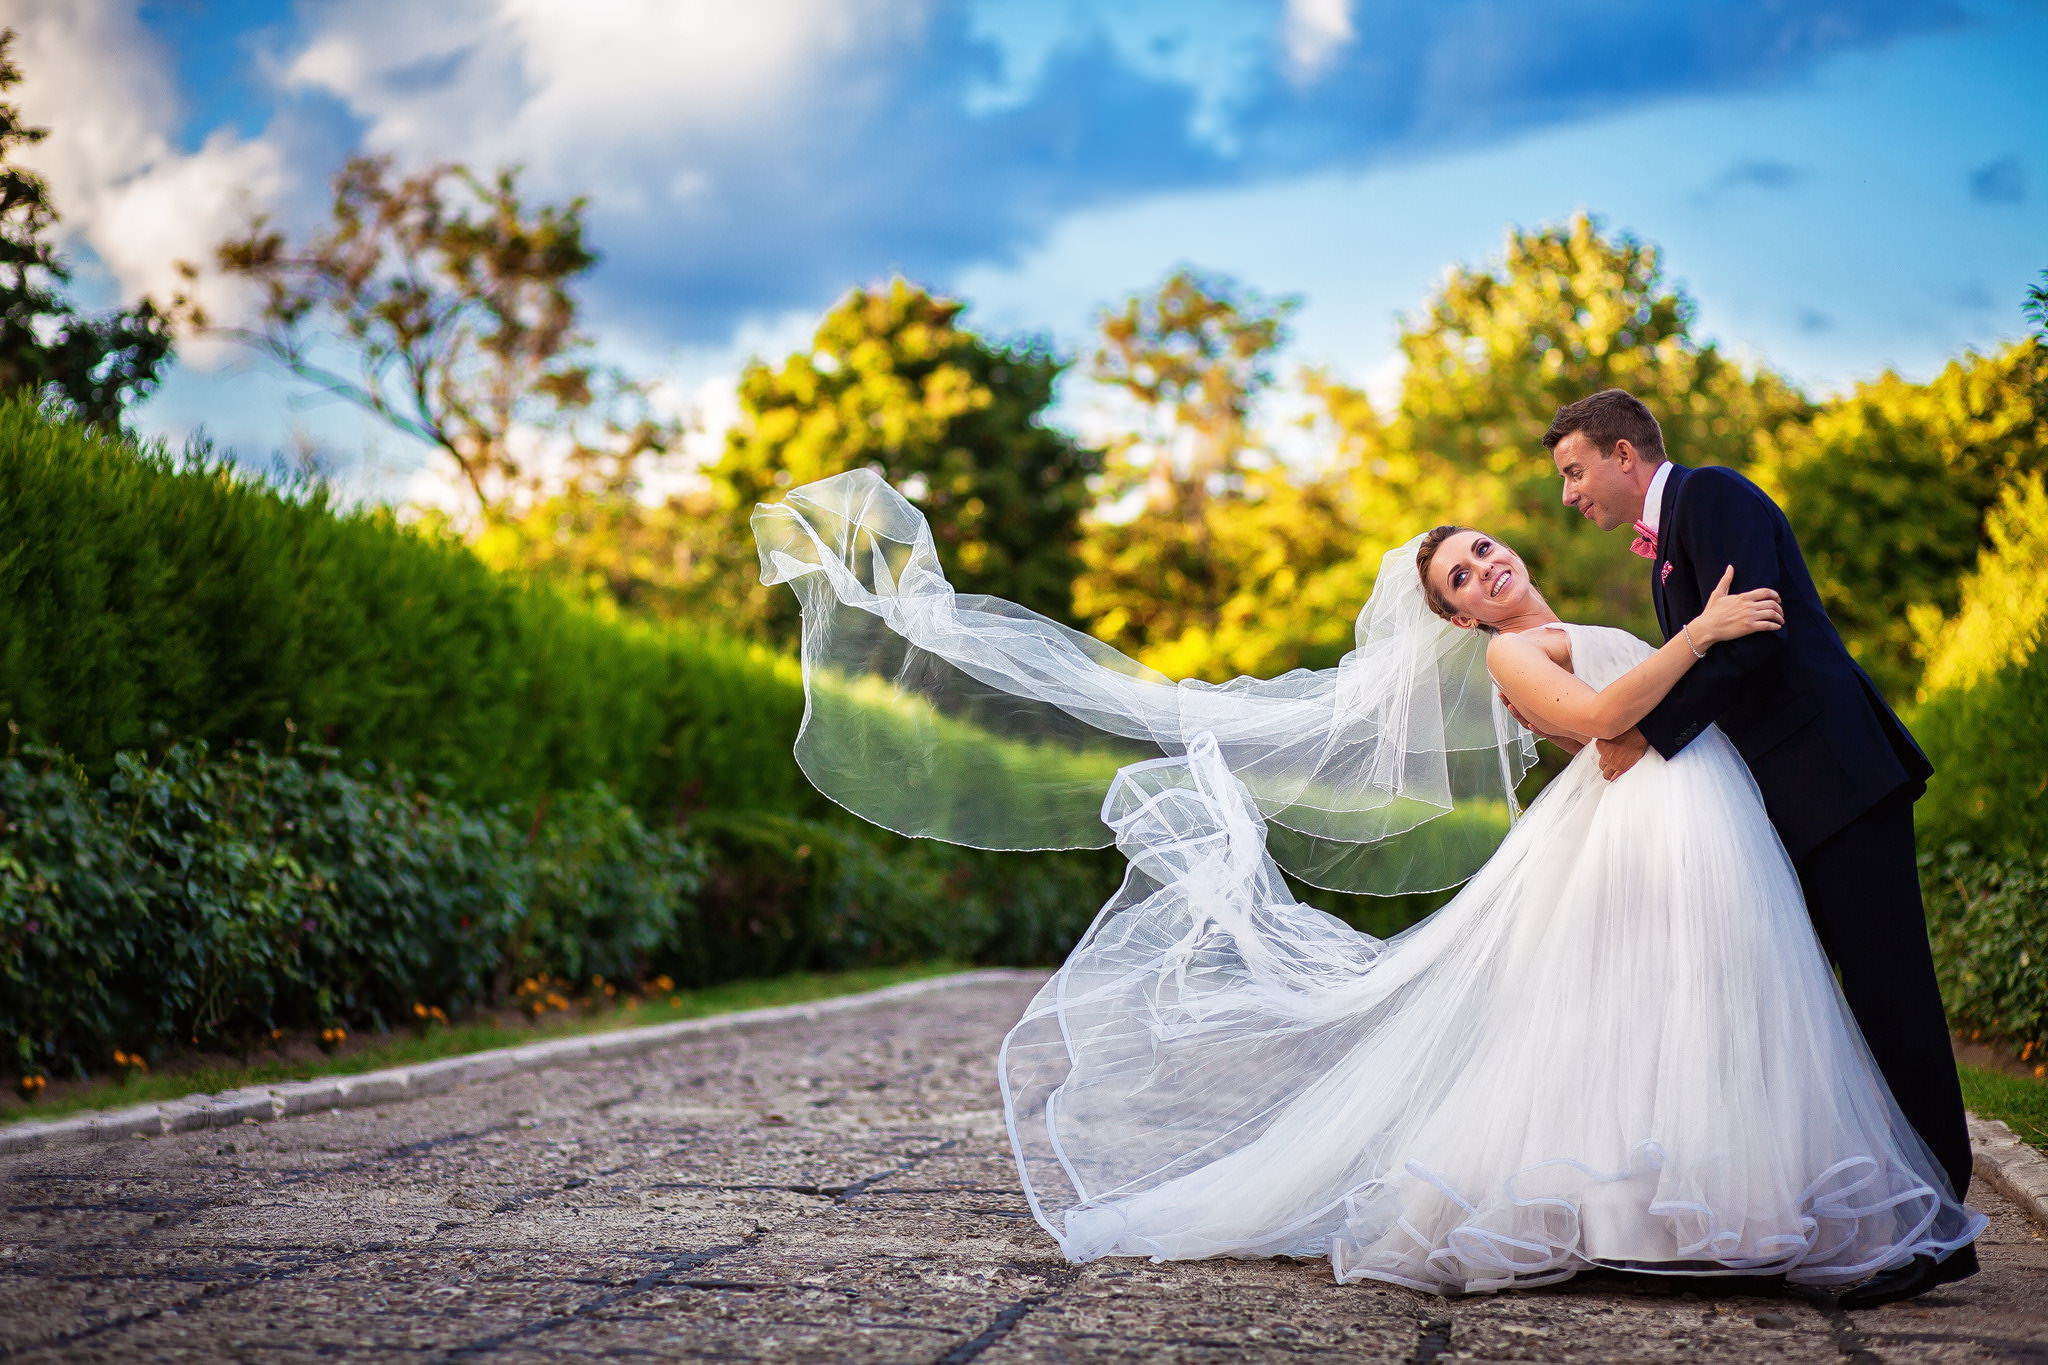 Andreea+Stefan, fotografie de nunta, fotograf de nunta Targoviste, fotograf profesionist, wedding, sedinta foto, fotografie creativa, nunta